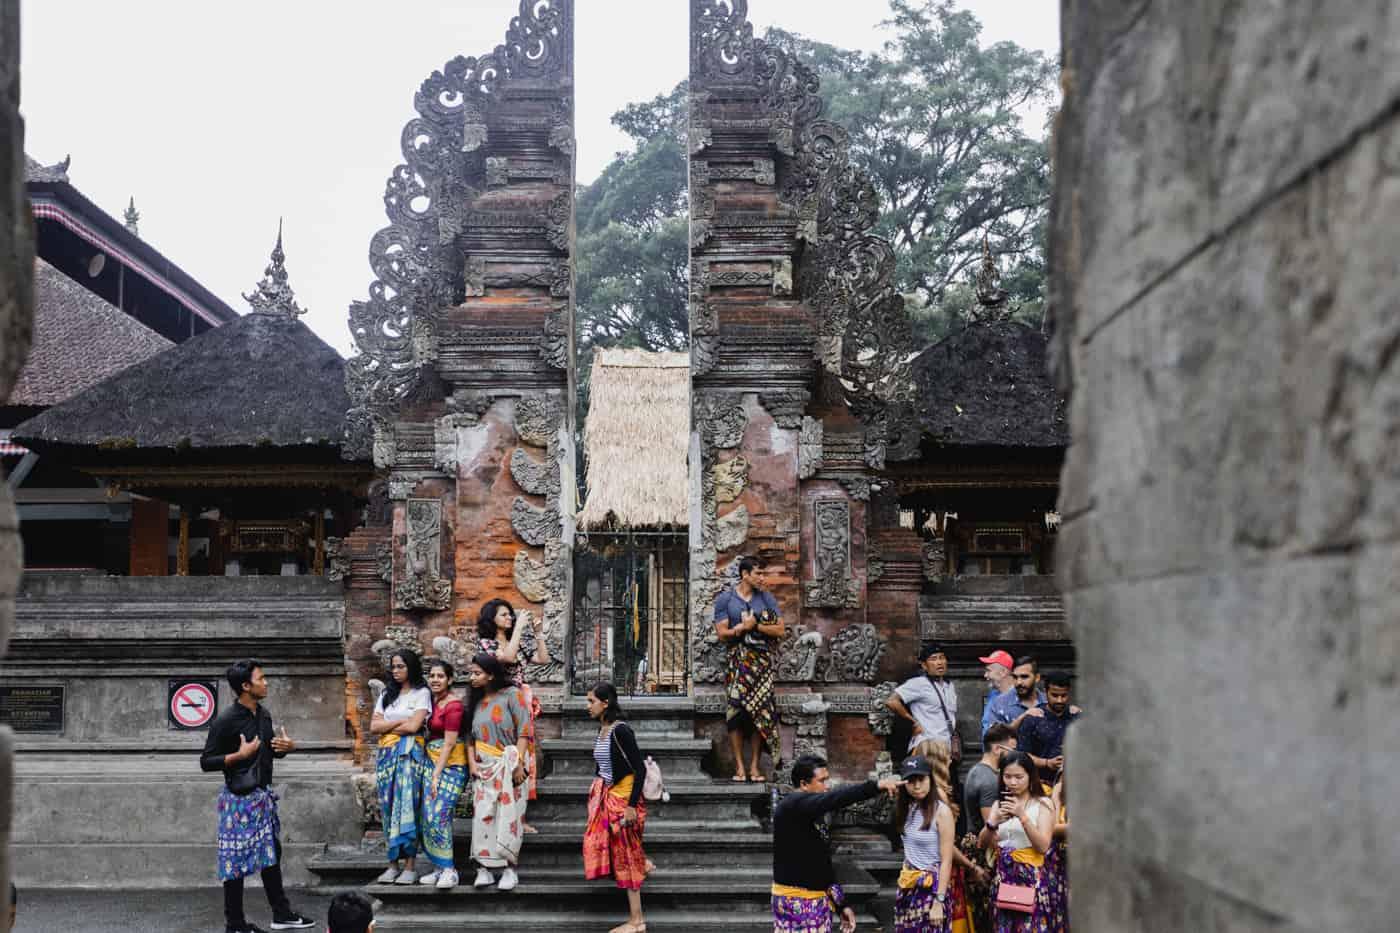 People wearing sarongs at Tirta Empul Temple in Bali